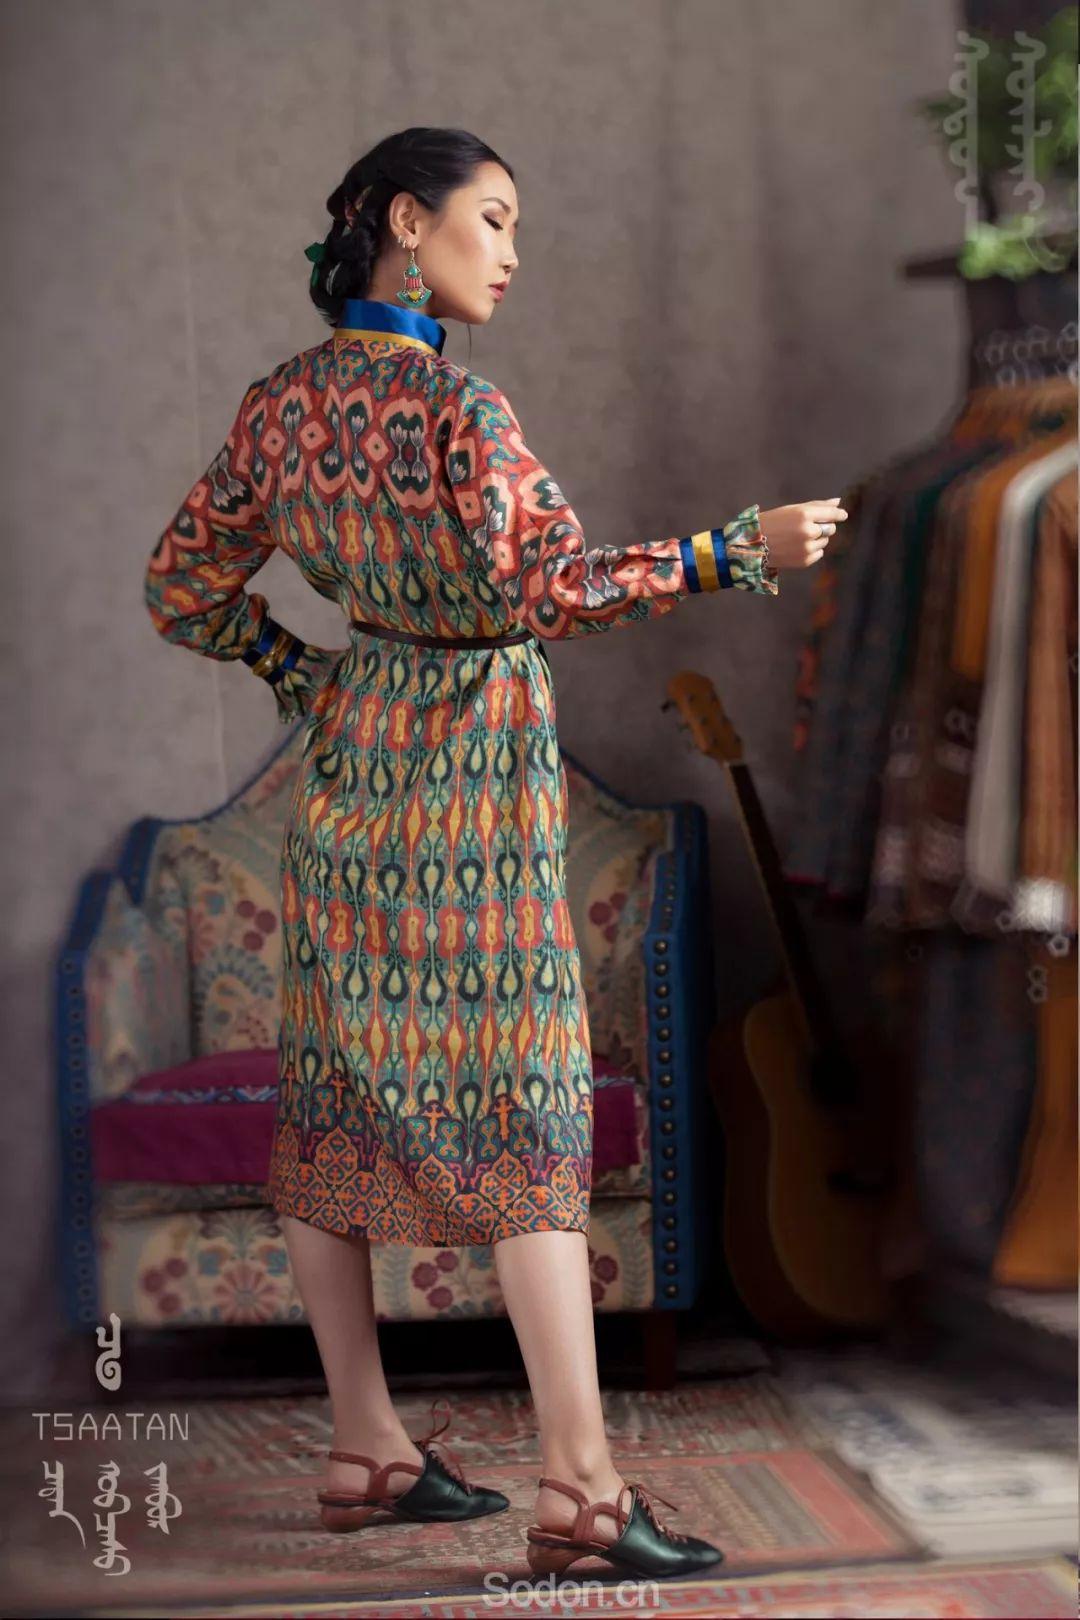 TSAATAN蒙古时装秋冬系列,来自驯鹿人的独特魅力! 第31张